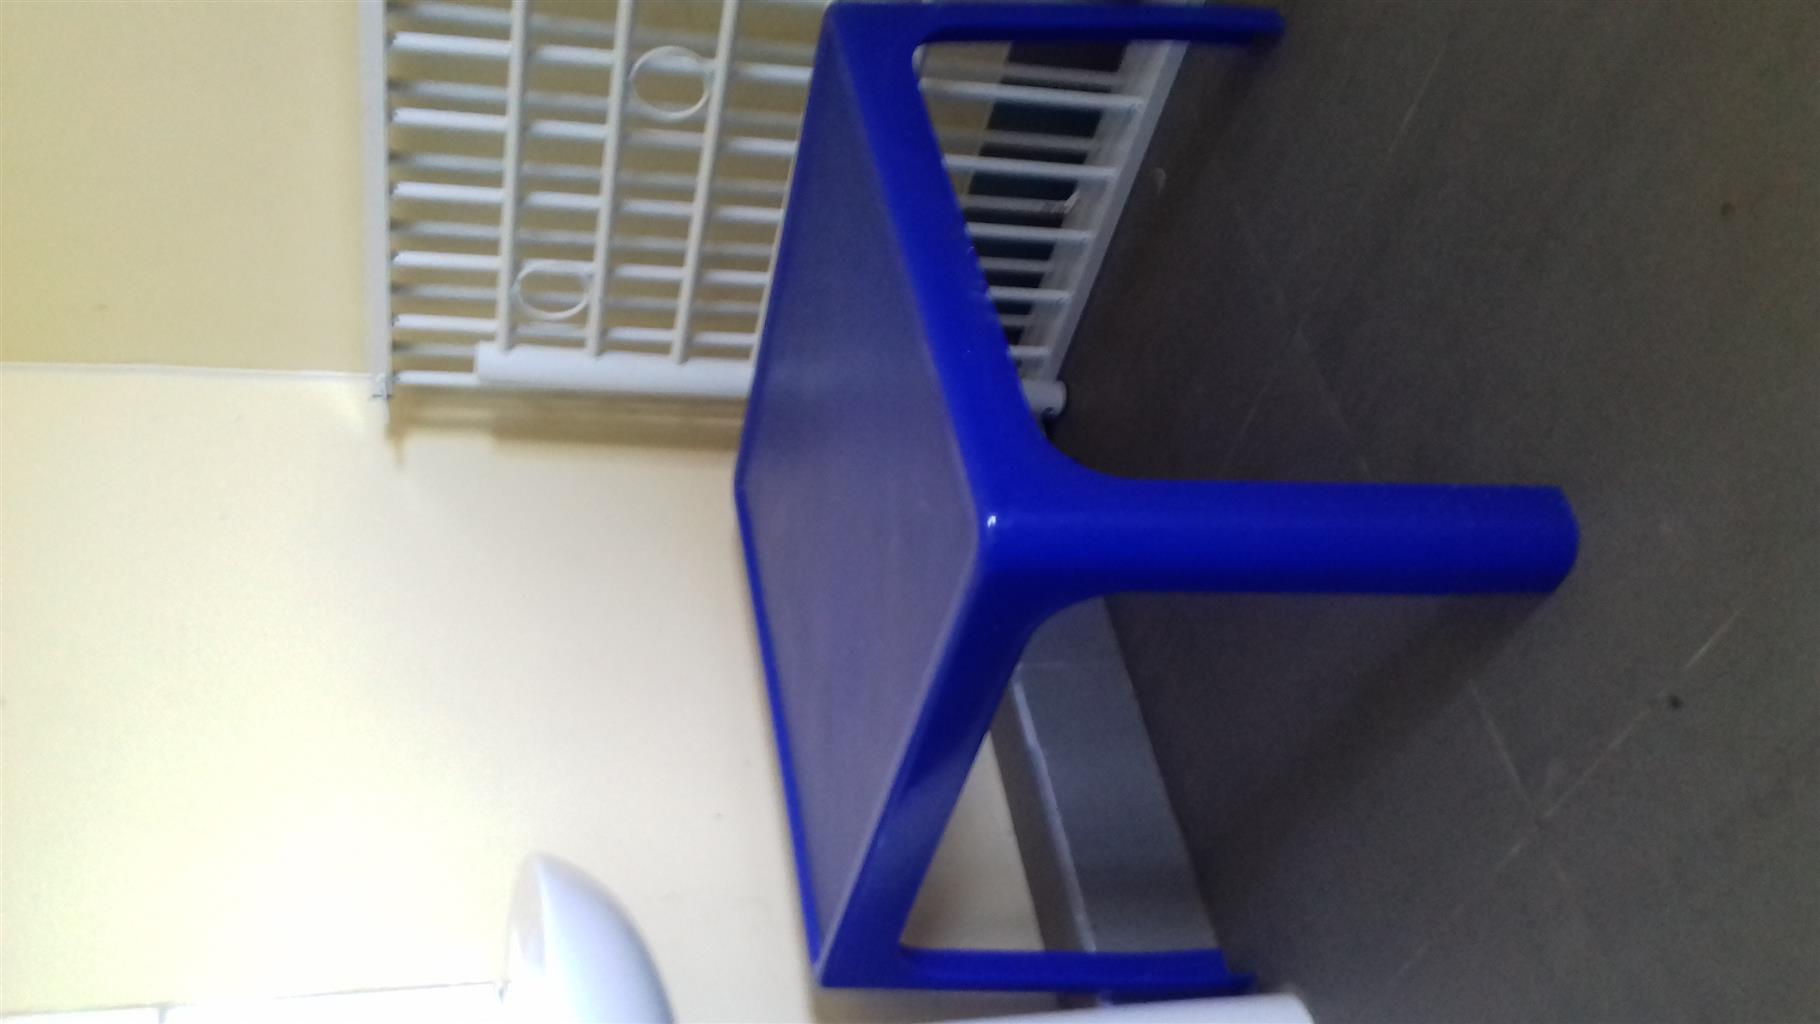 Blue plastic table